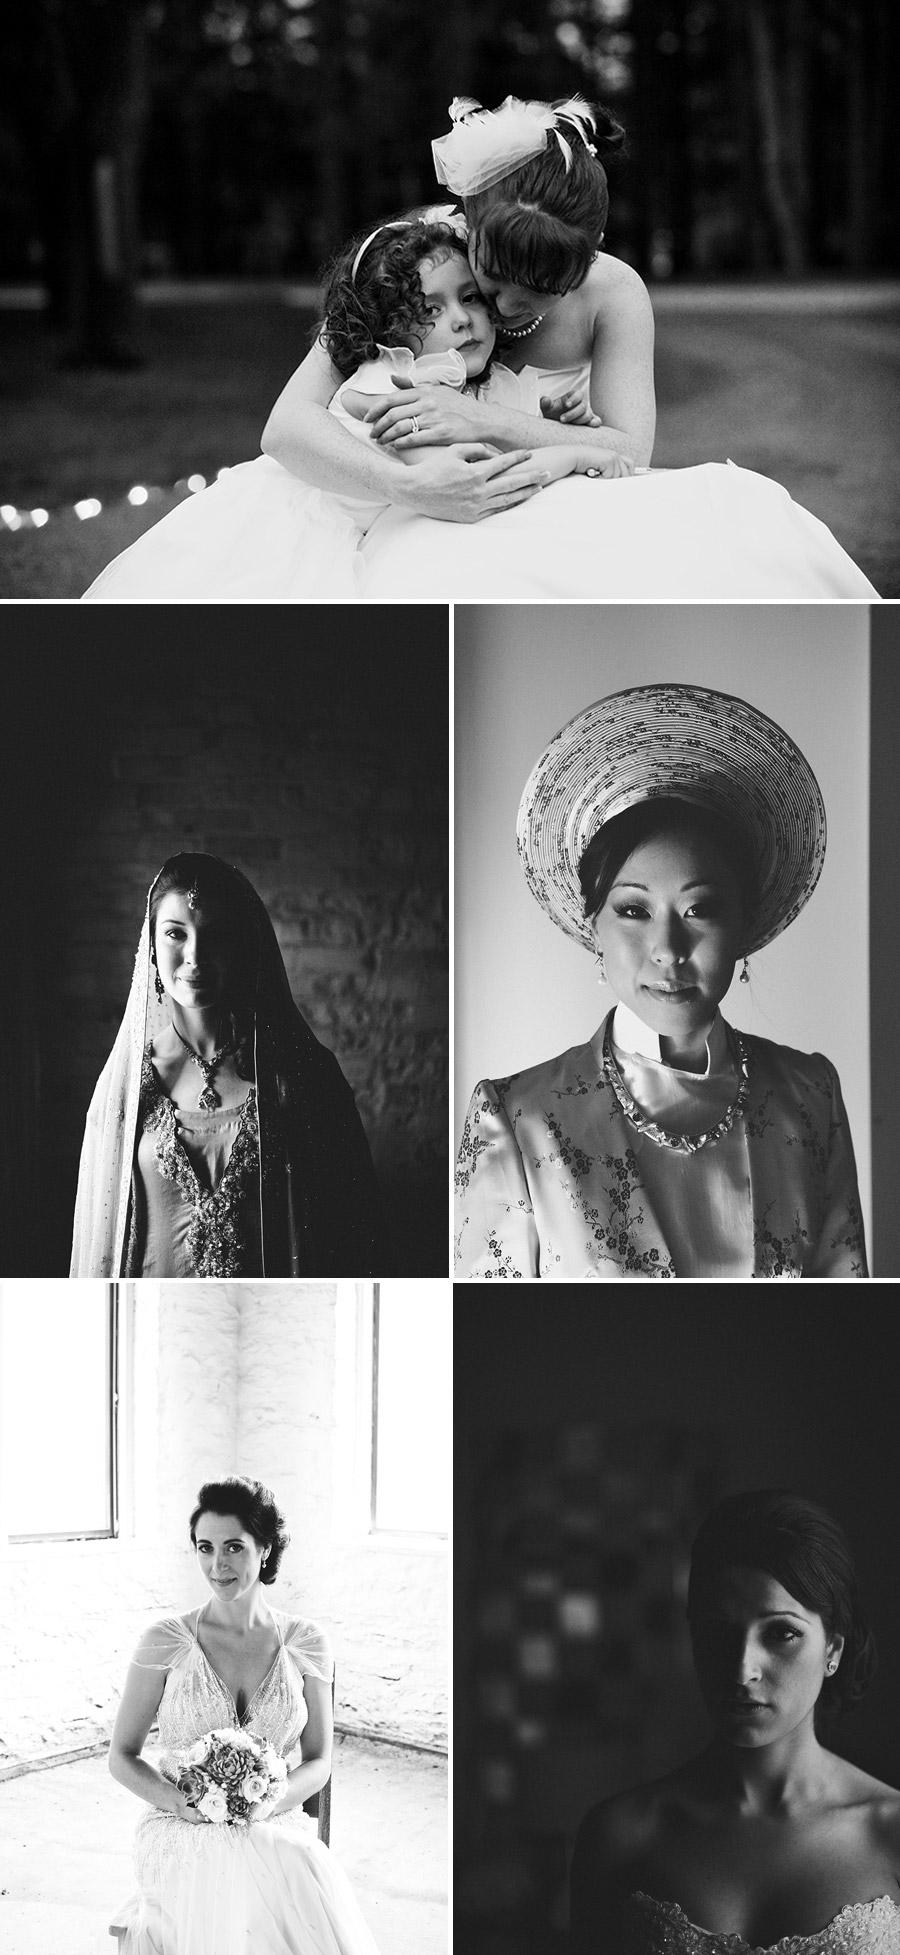 Blog-Collage-1391483769128.jpg